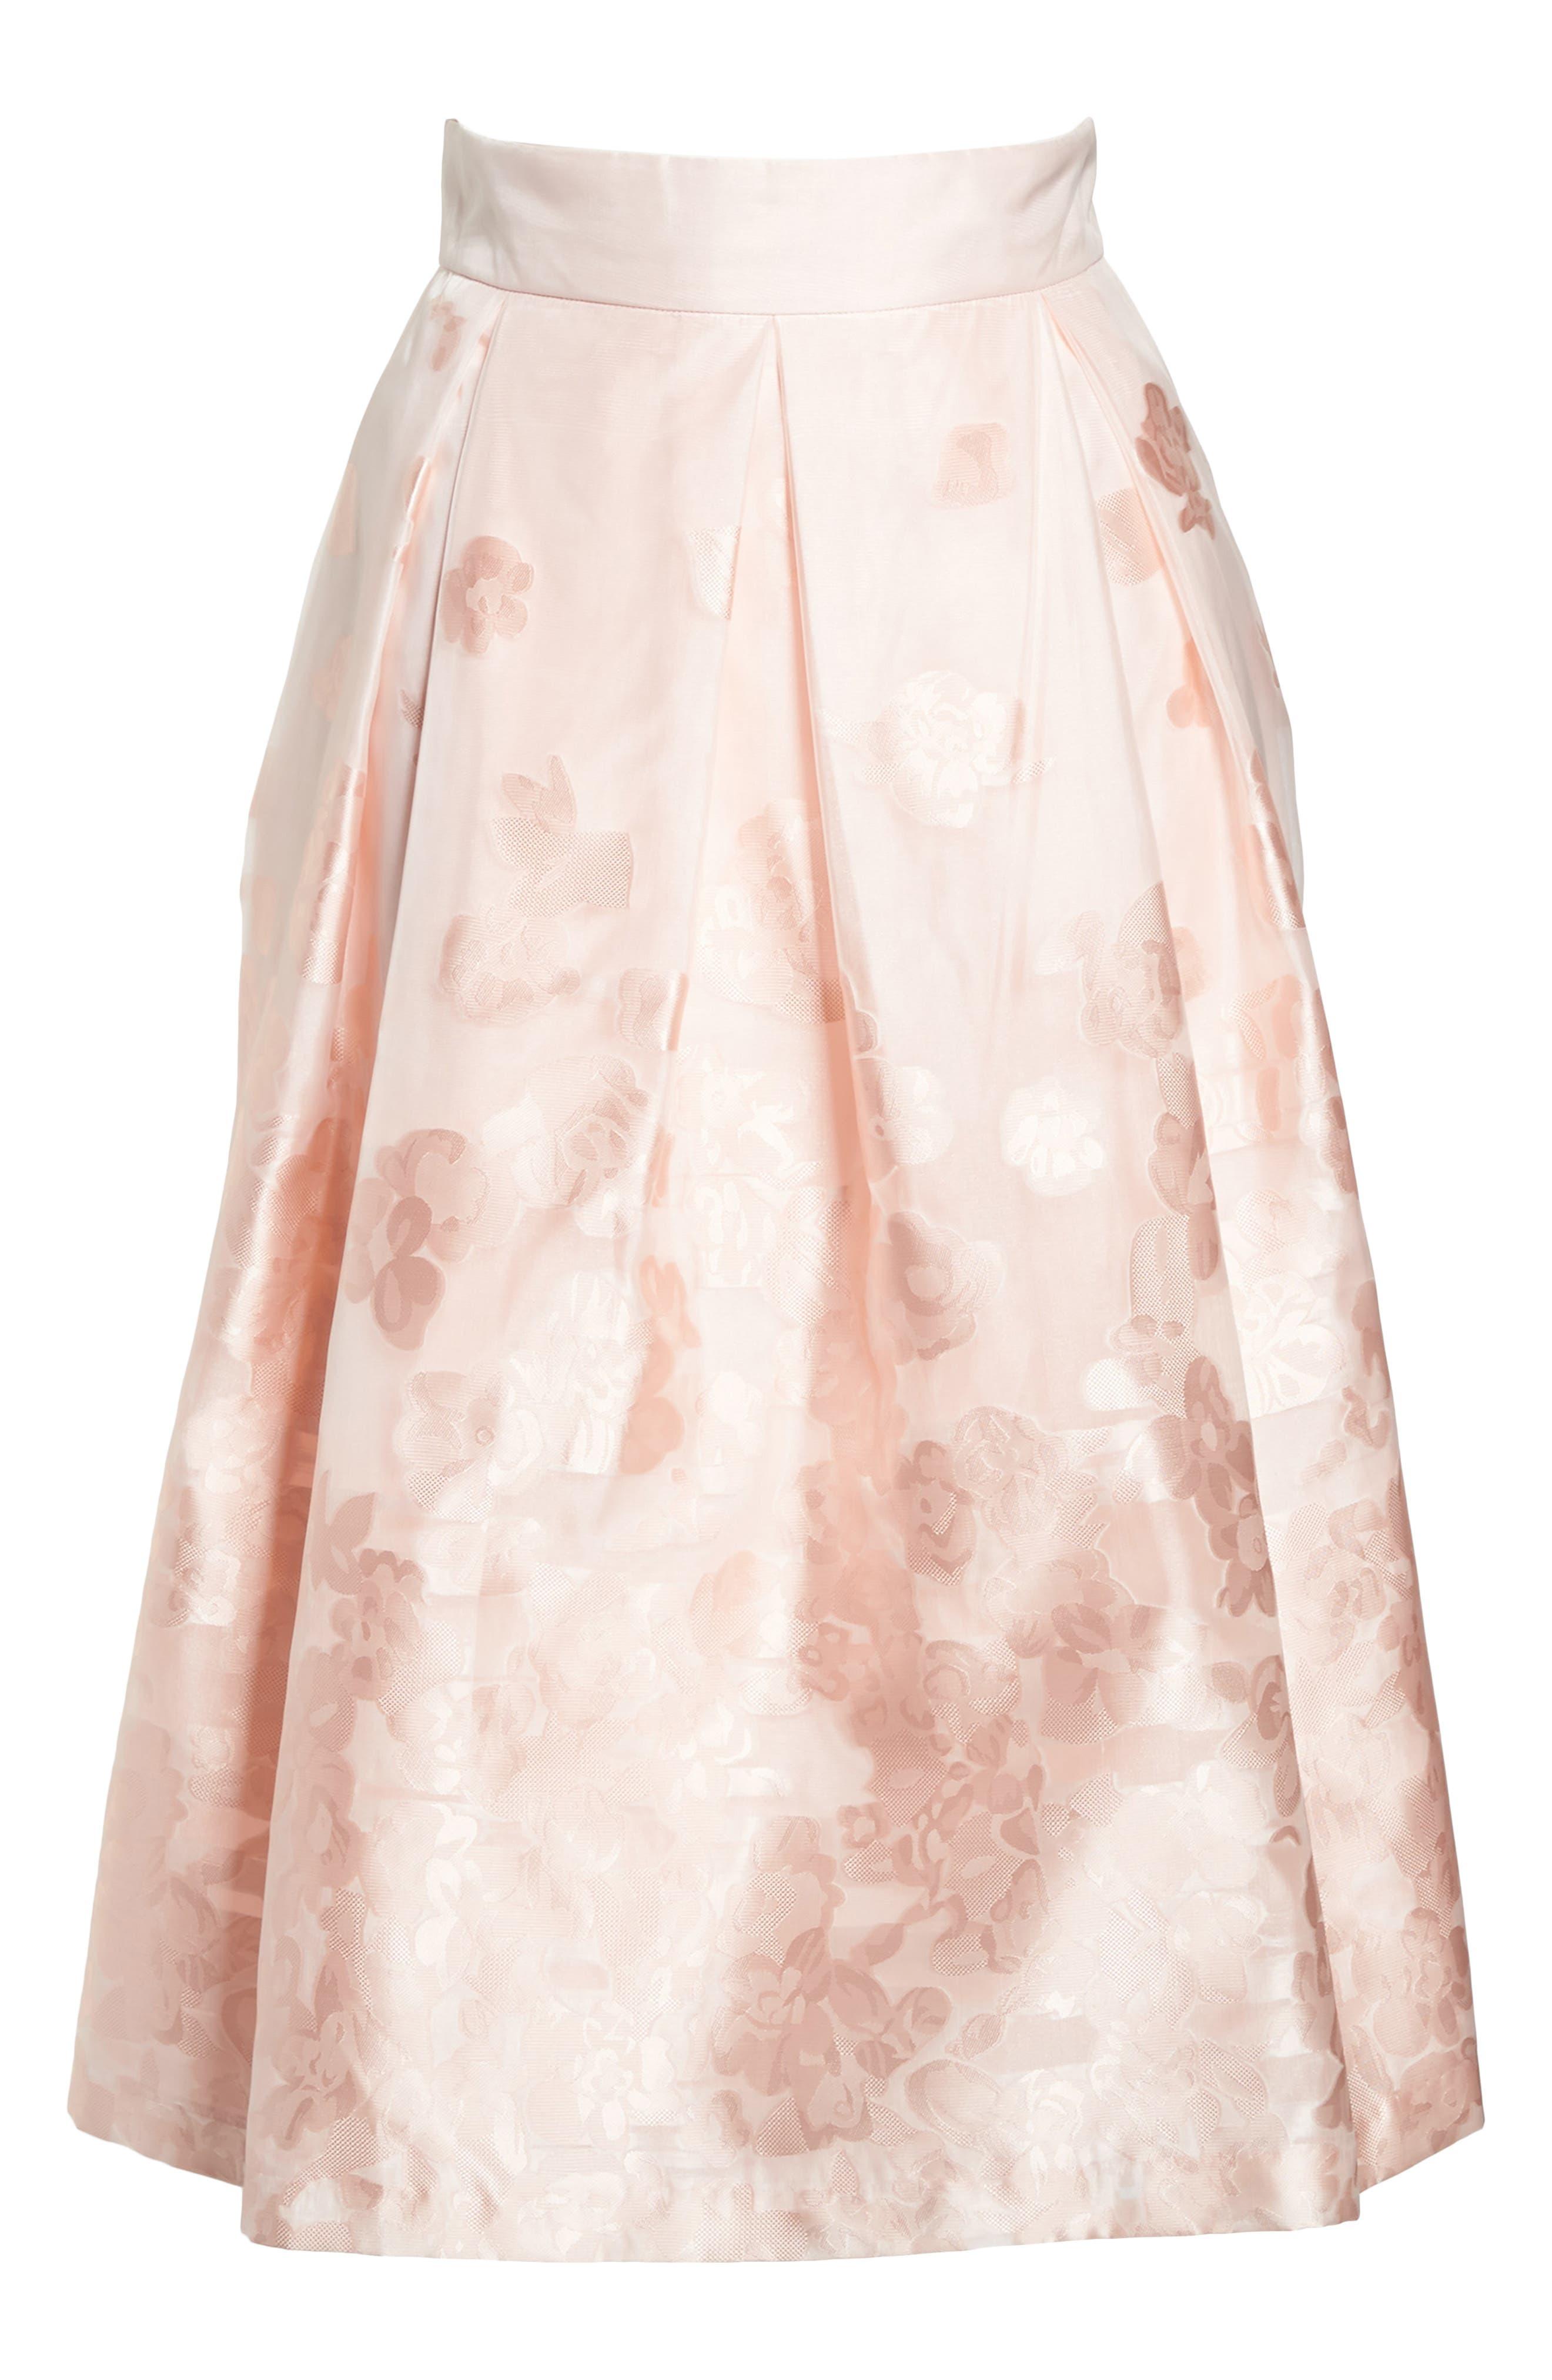 Jacquard A-Line Skirt,                             Alternate thumbnail 6, color,                             684